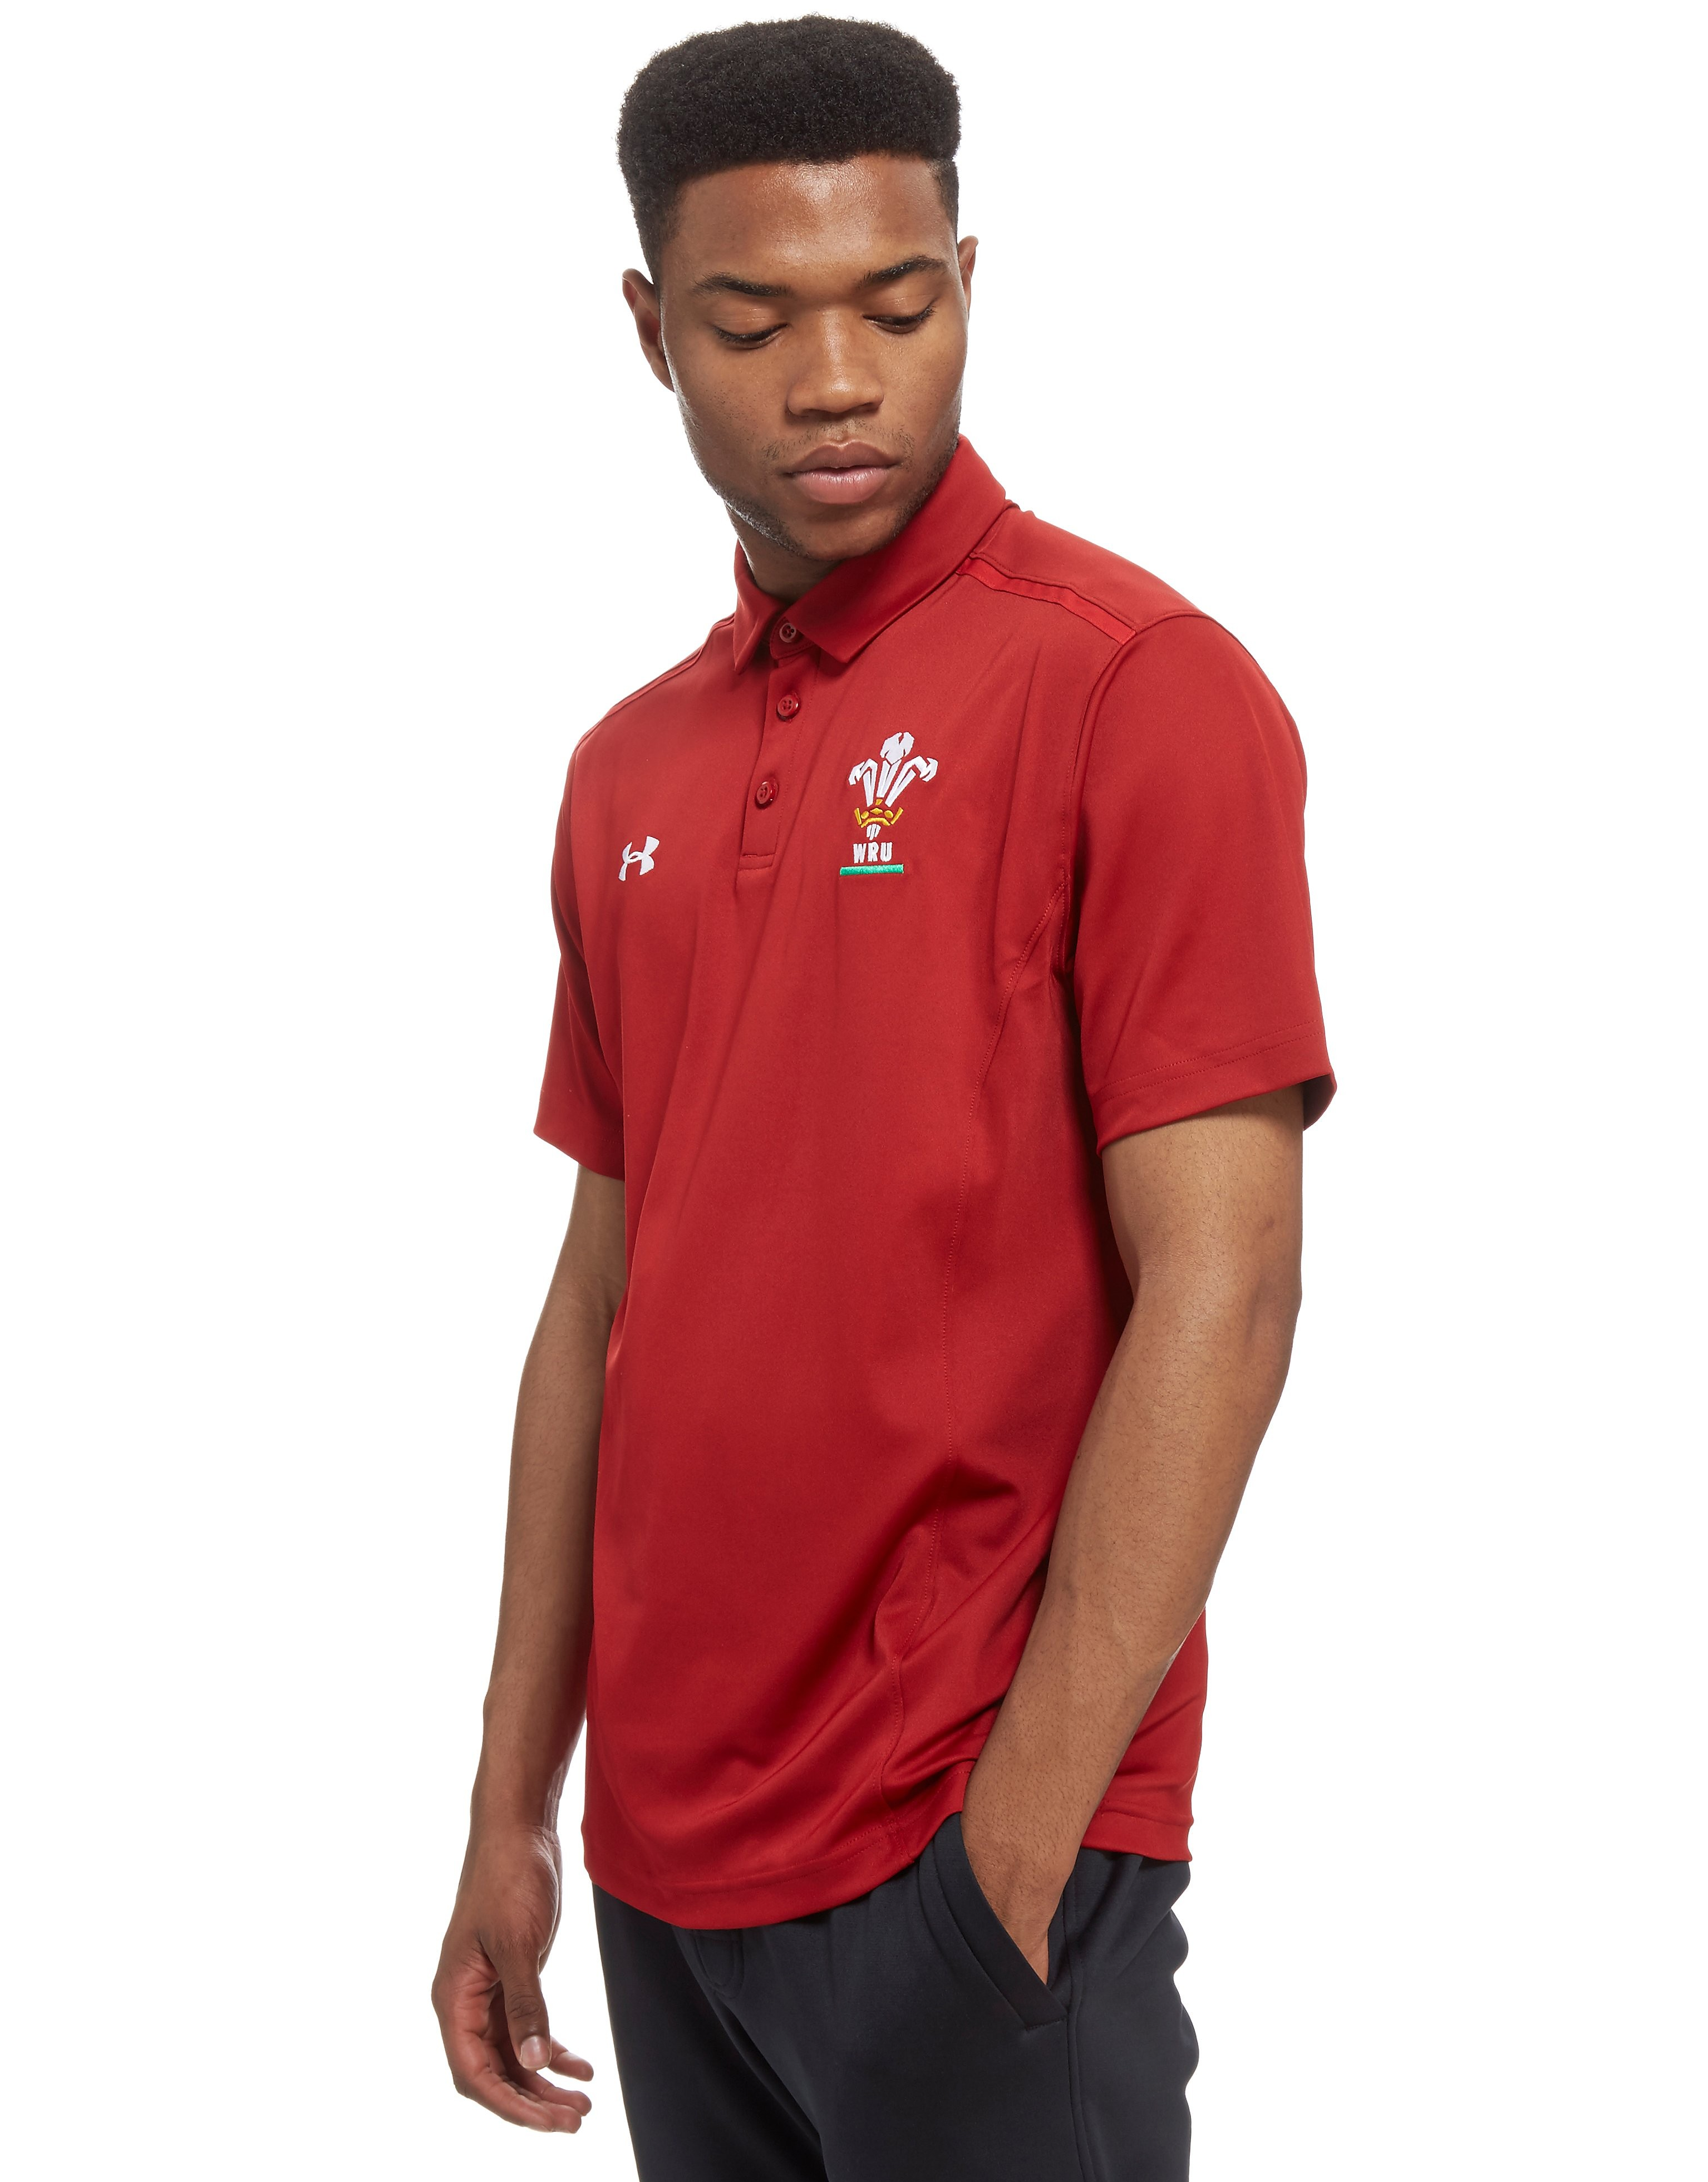 Under Armour Wales RU Polo Shirt